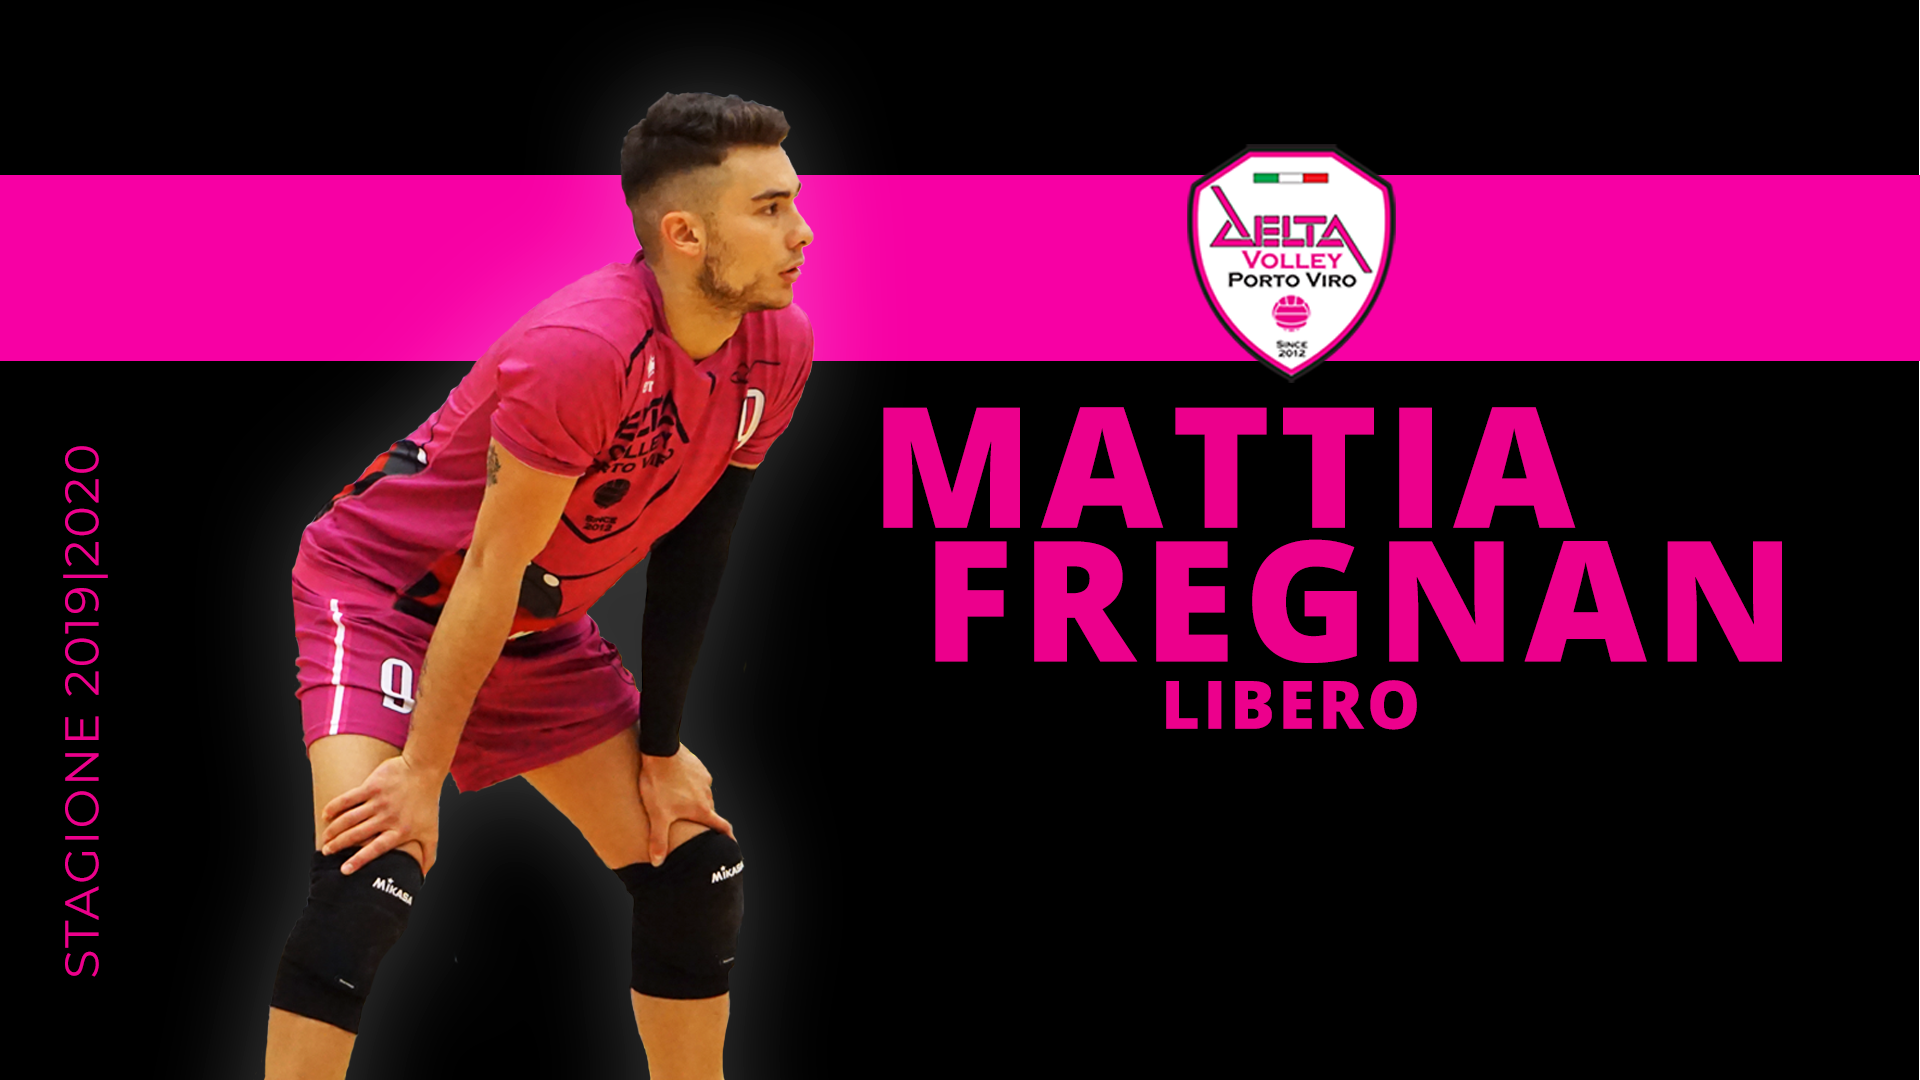 Mattia Fregnan